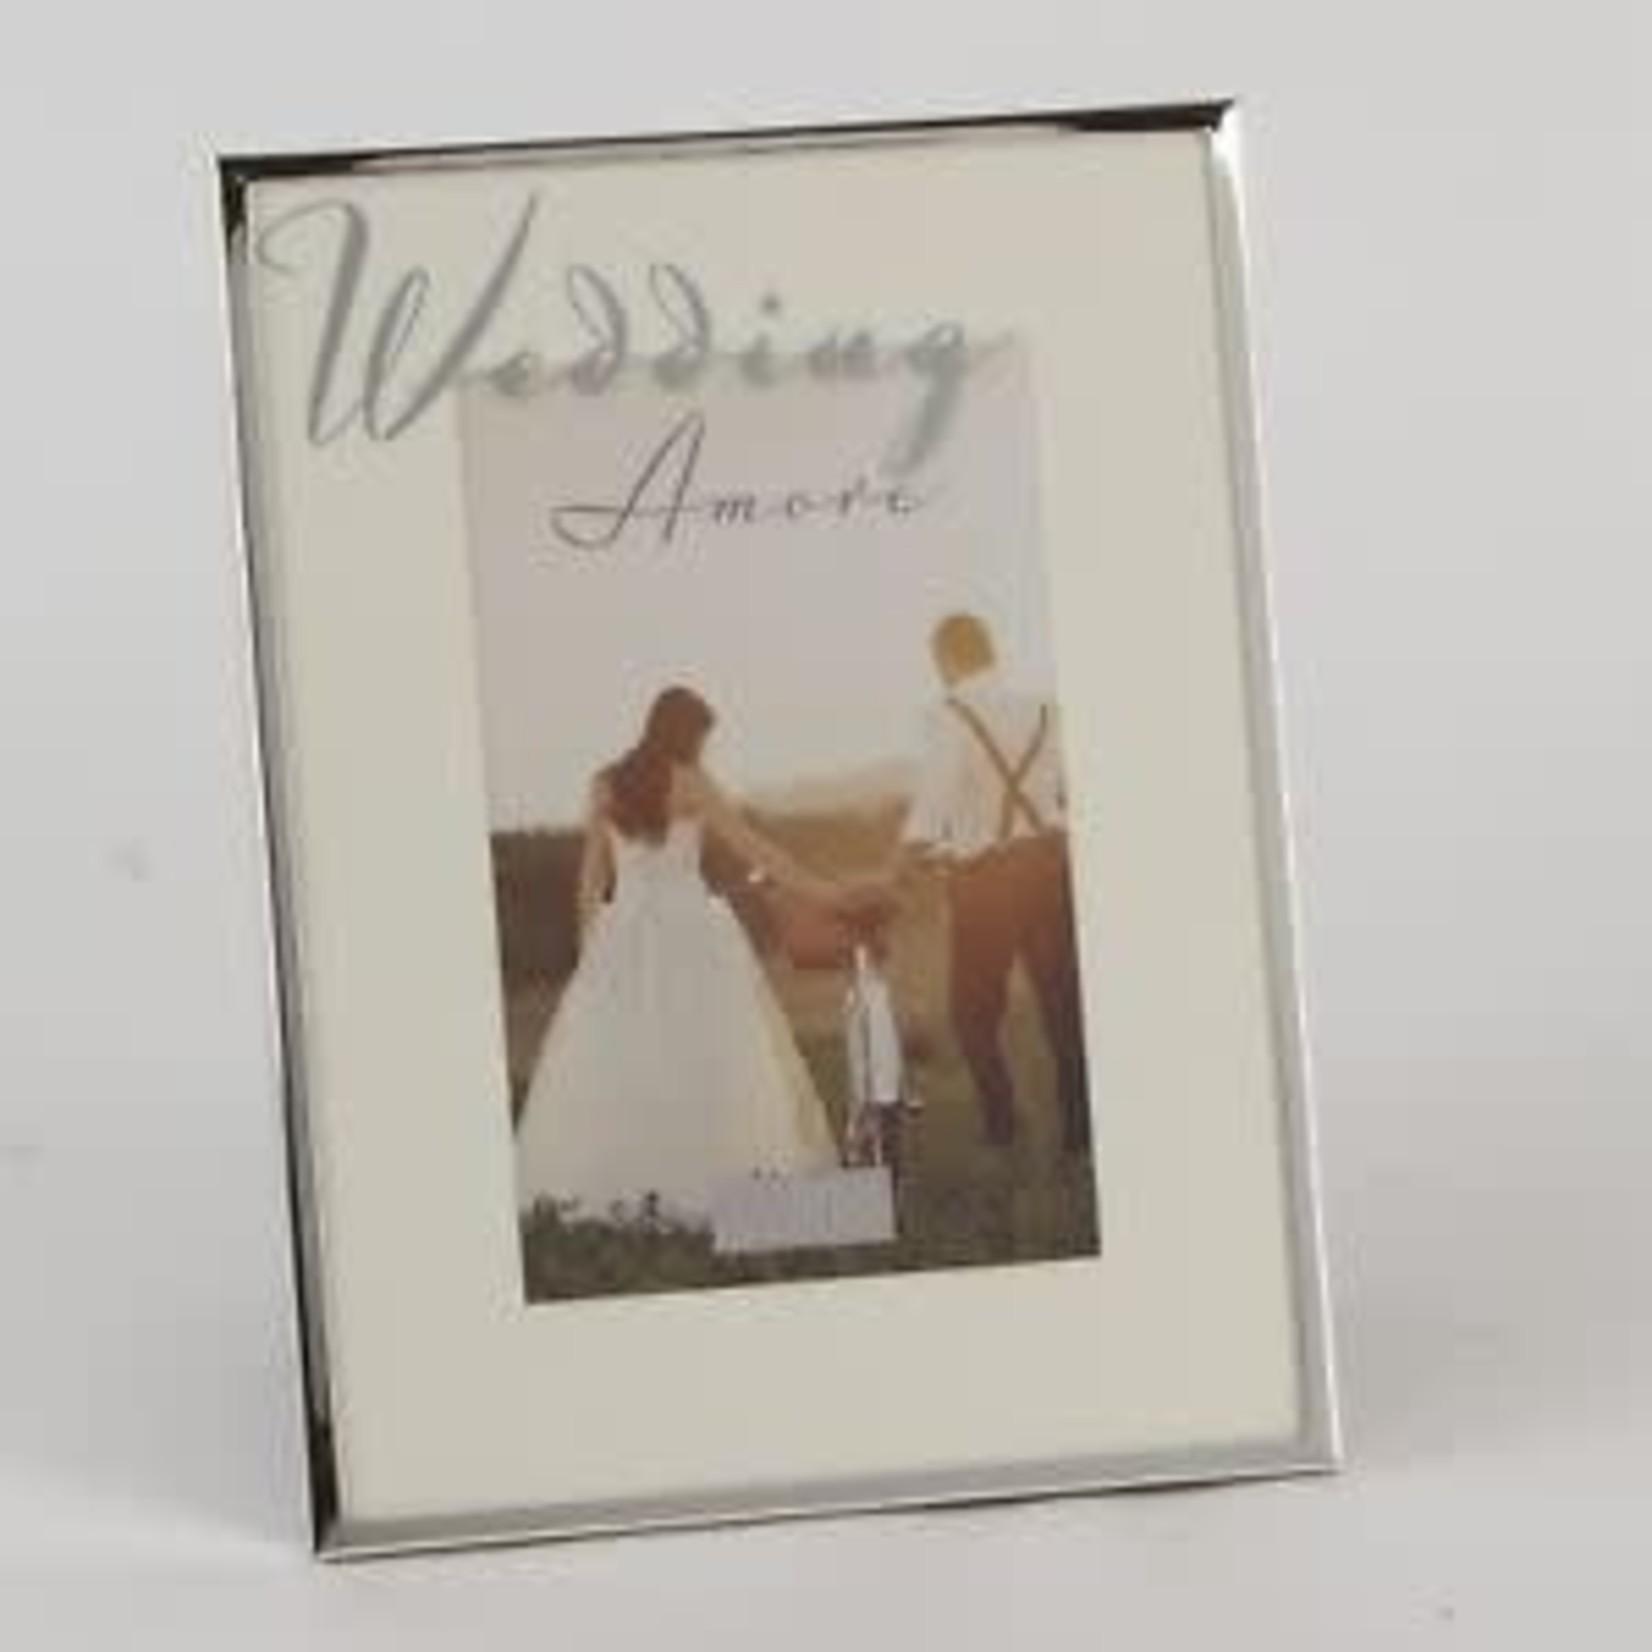 "Amore Silver Plated Frame Mirror Script 4"" x 6"" Wedding"